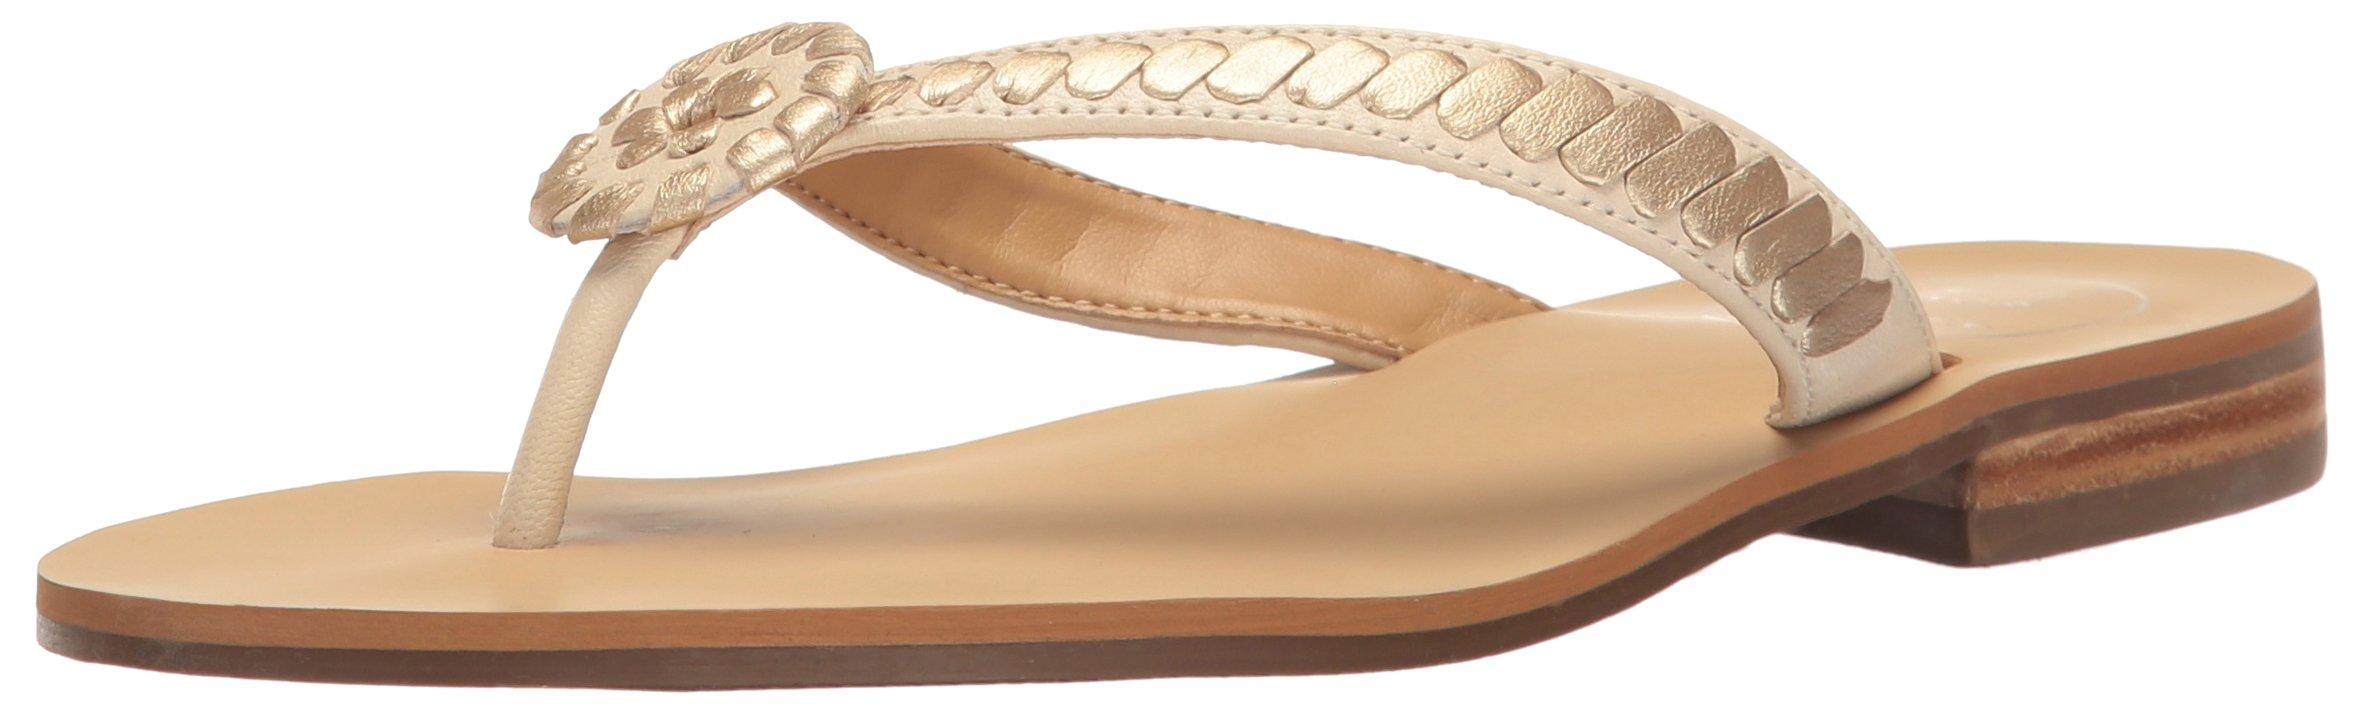 Jack Rogers Women's Ali Dress Sandal, Bone/Gold, 6 M US